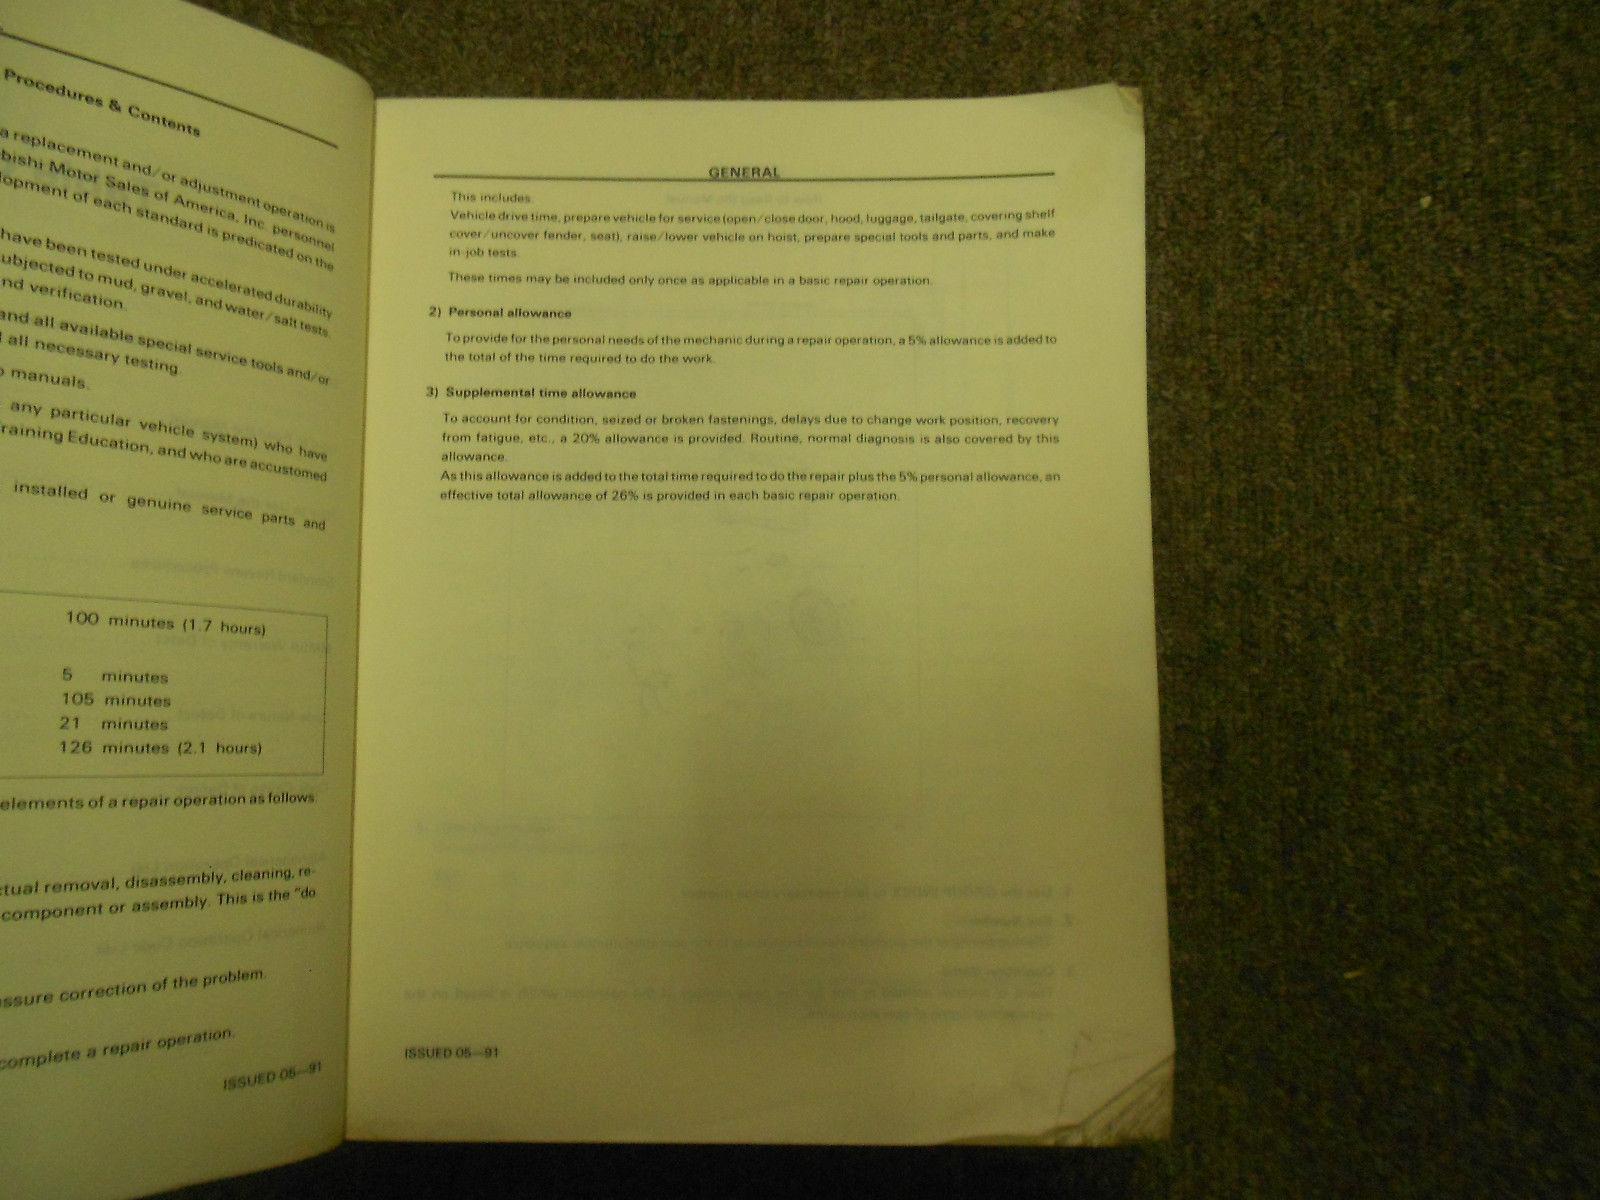 1992 MITSUBISHI Precis Service Repair Shop Manual SET FACTORY OEM BOOK 92 DEAL